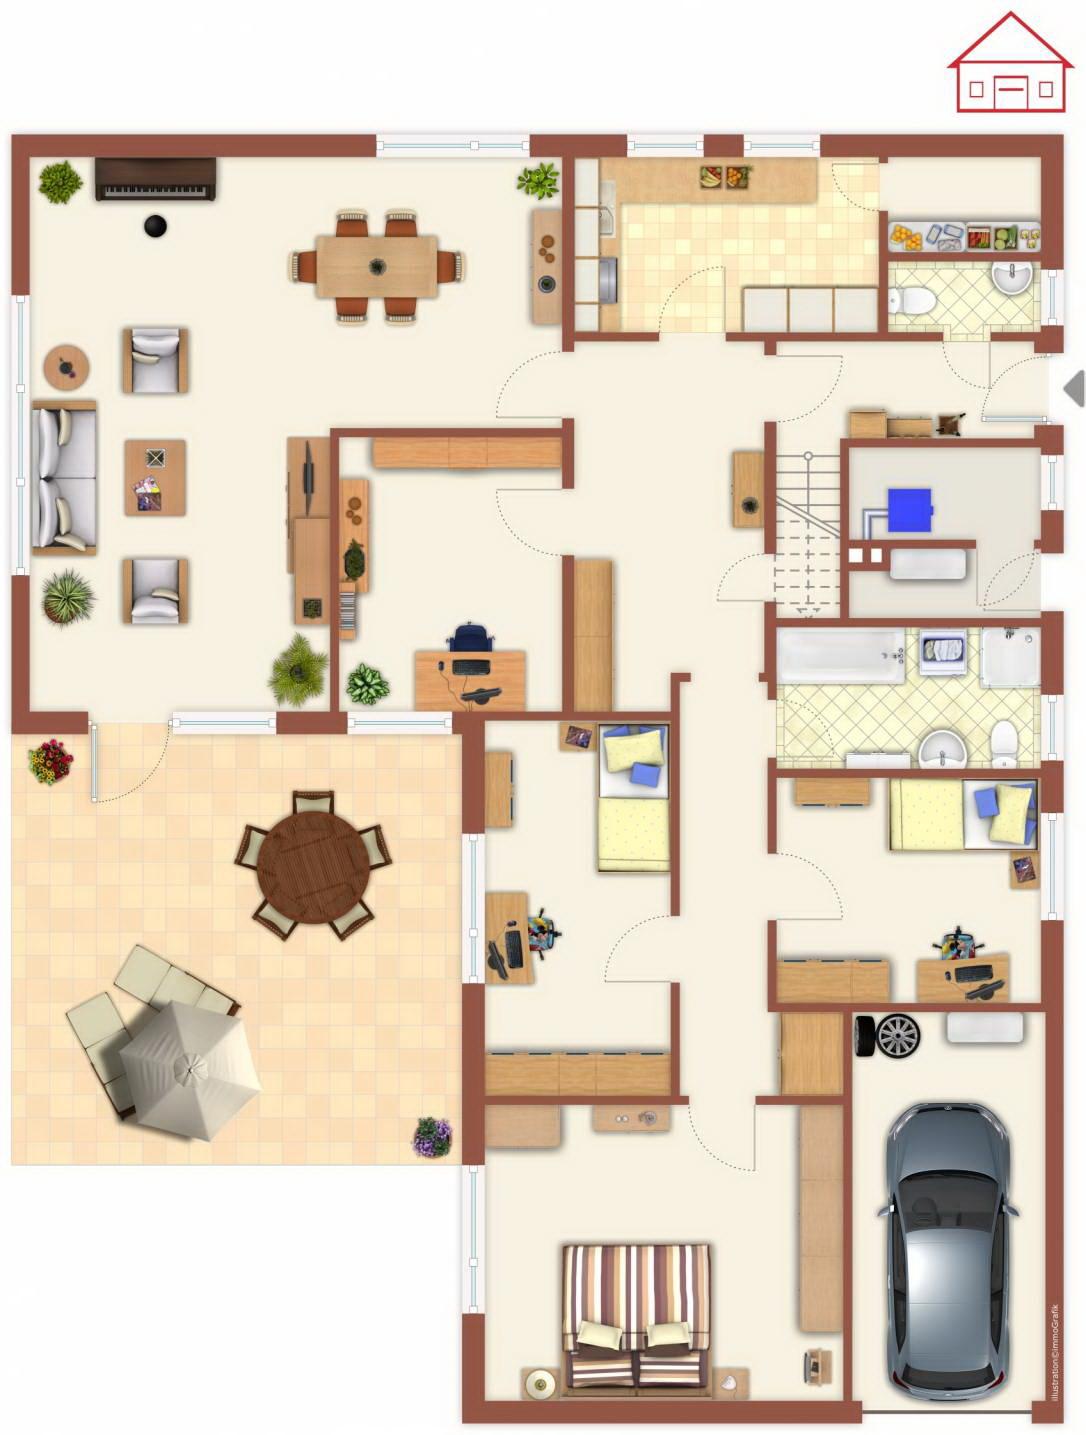 immoGrafik_273650087002-Marssel - Plan 2_DIN_A4_INTERNET